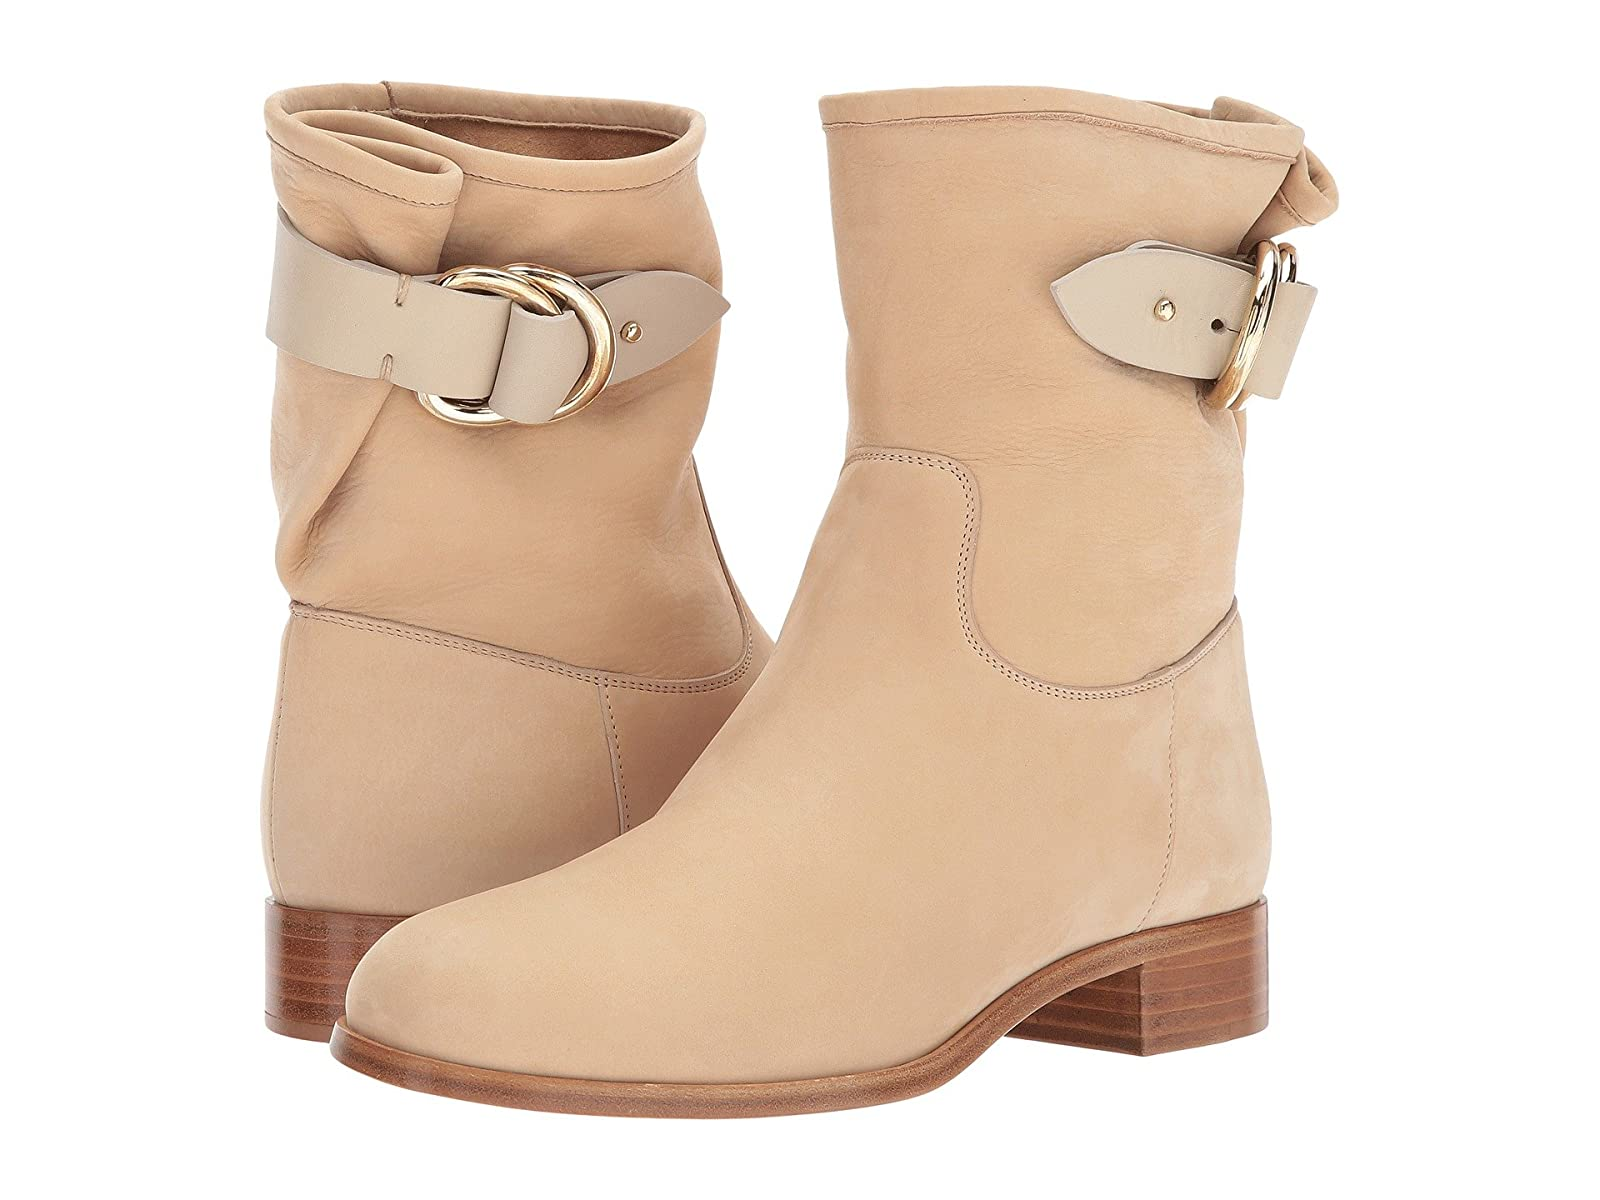 Frye Ricki Ring FoldCheap and distinctive eye-catching shoes